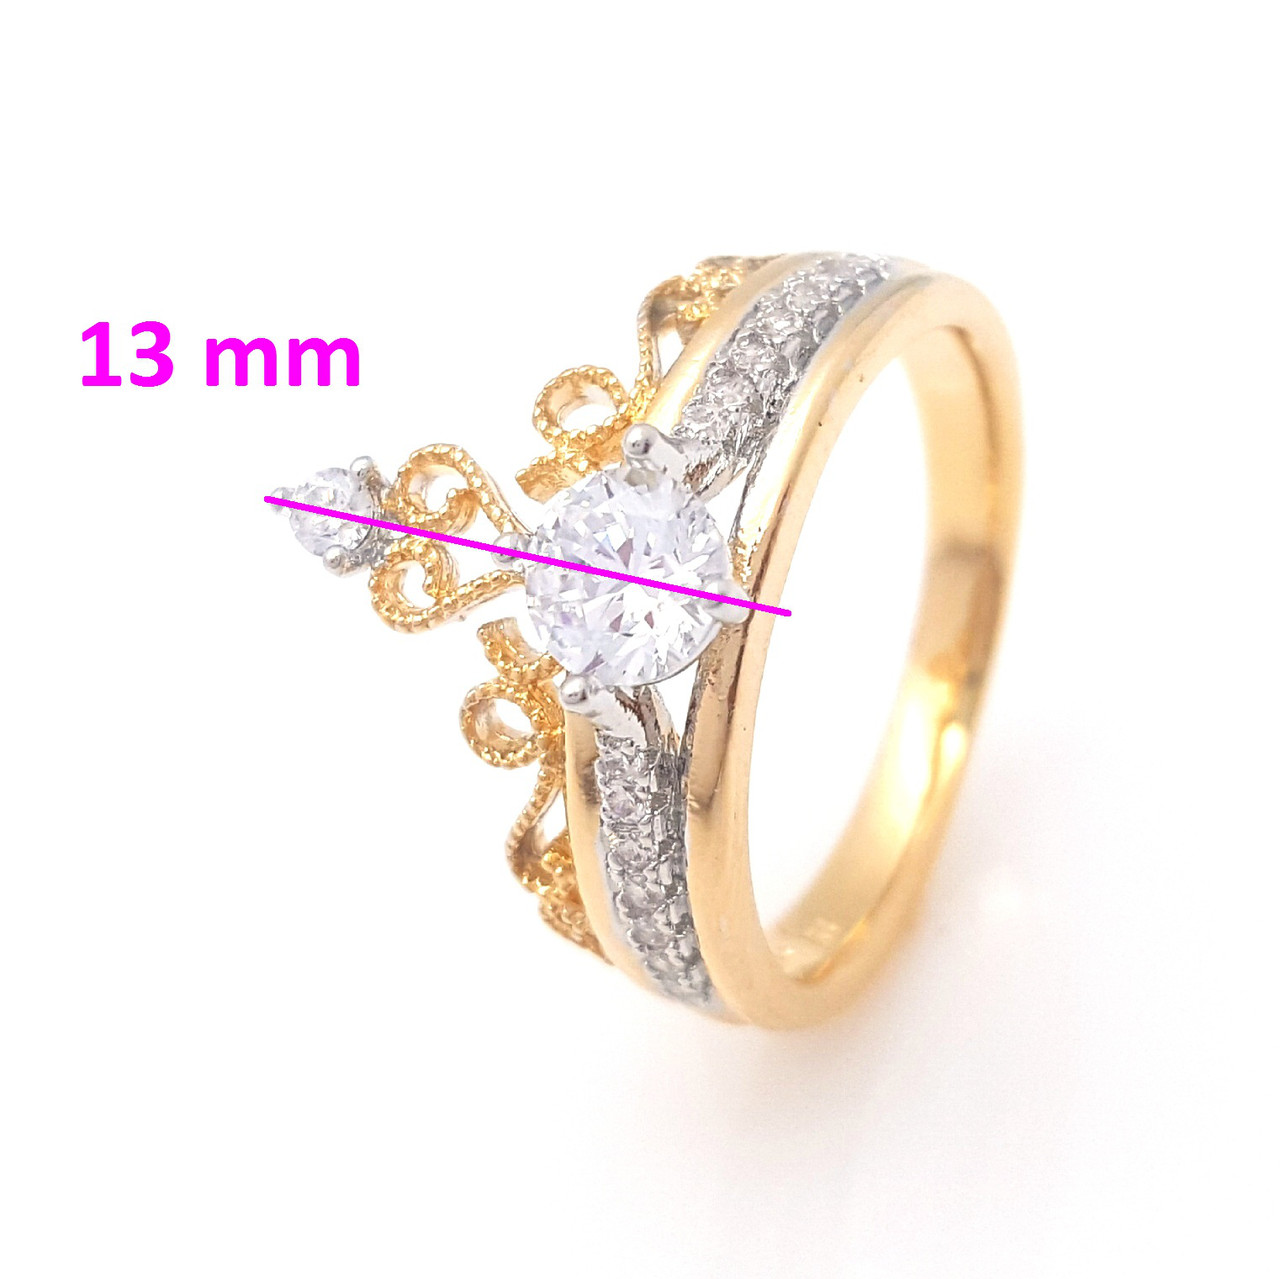 Кольцо Корона с цирконием, р.16, р.17, р.18, р.18,5, р.19,5 позолота+родий